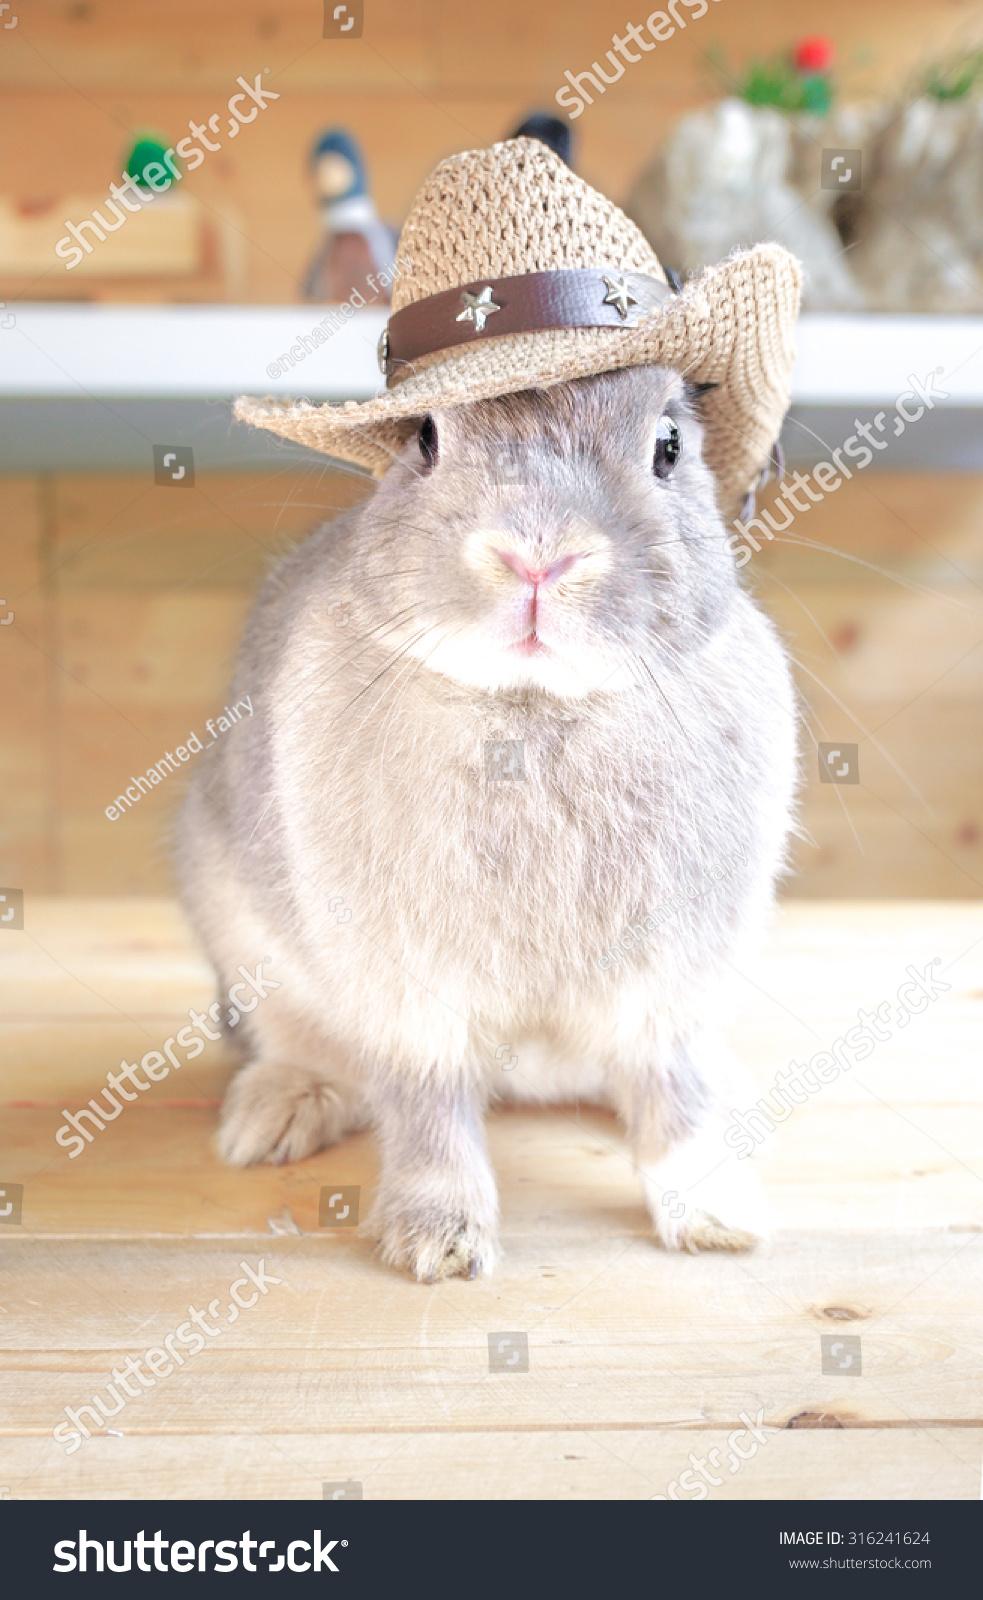 Adorable Rabbit Wearing Cowboy Hat Netherland Stock Photo (Edit Now ... 0426cad38c8